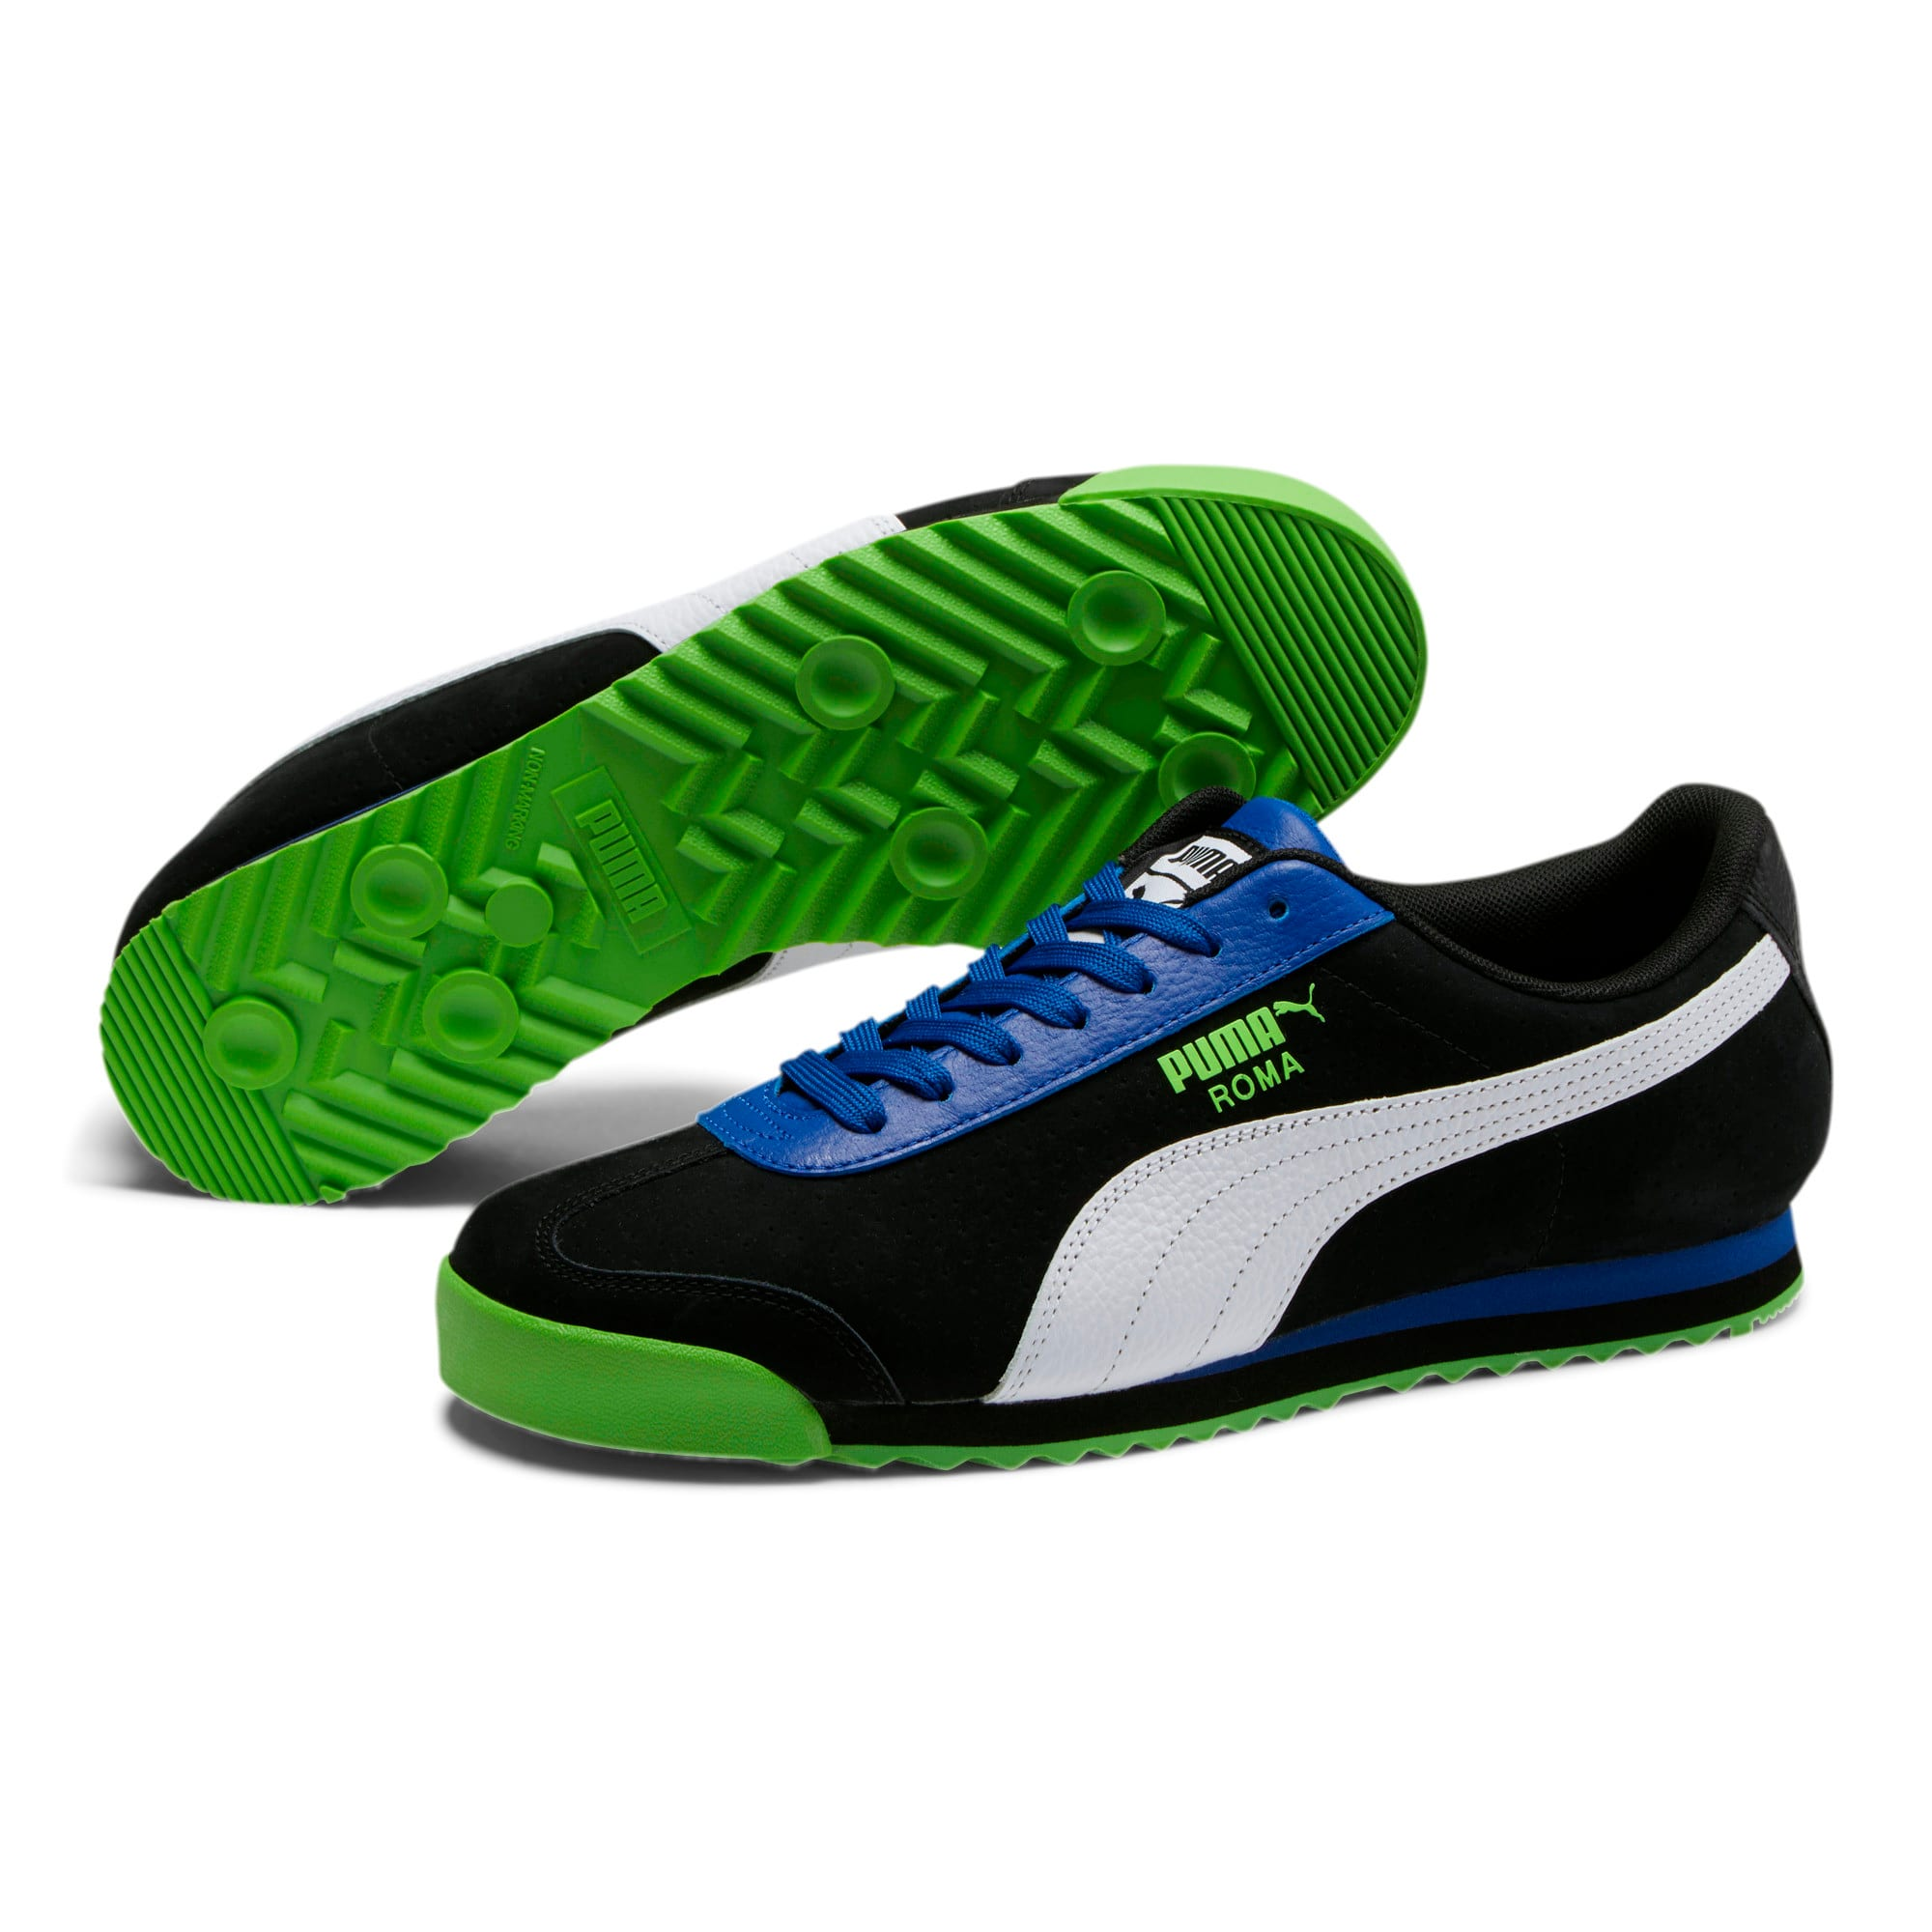 Thumbnail 2 of Roma XTG Perf Men's Sneakers, Puma Black-Surf The Web, medium